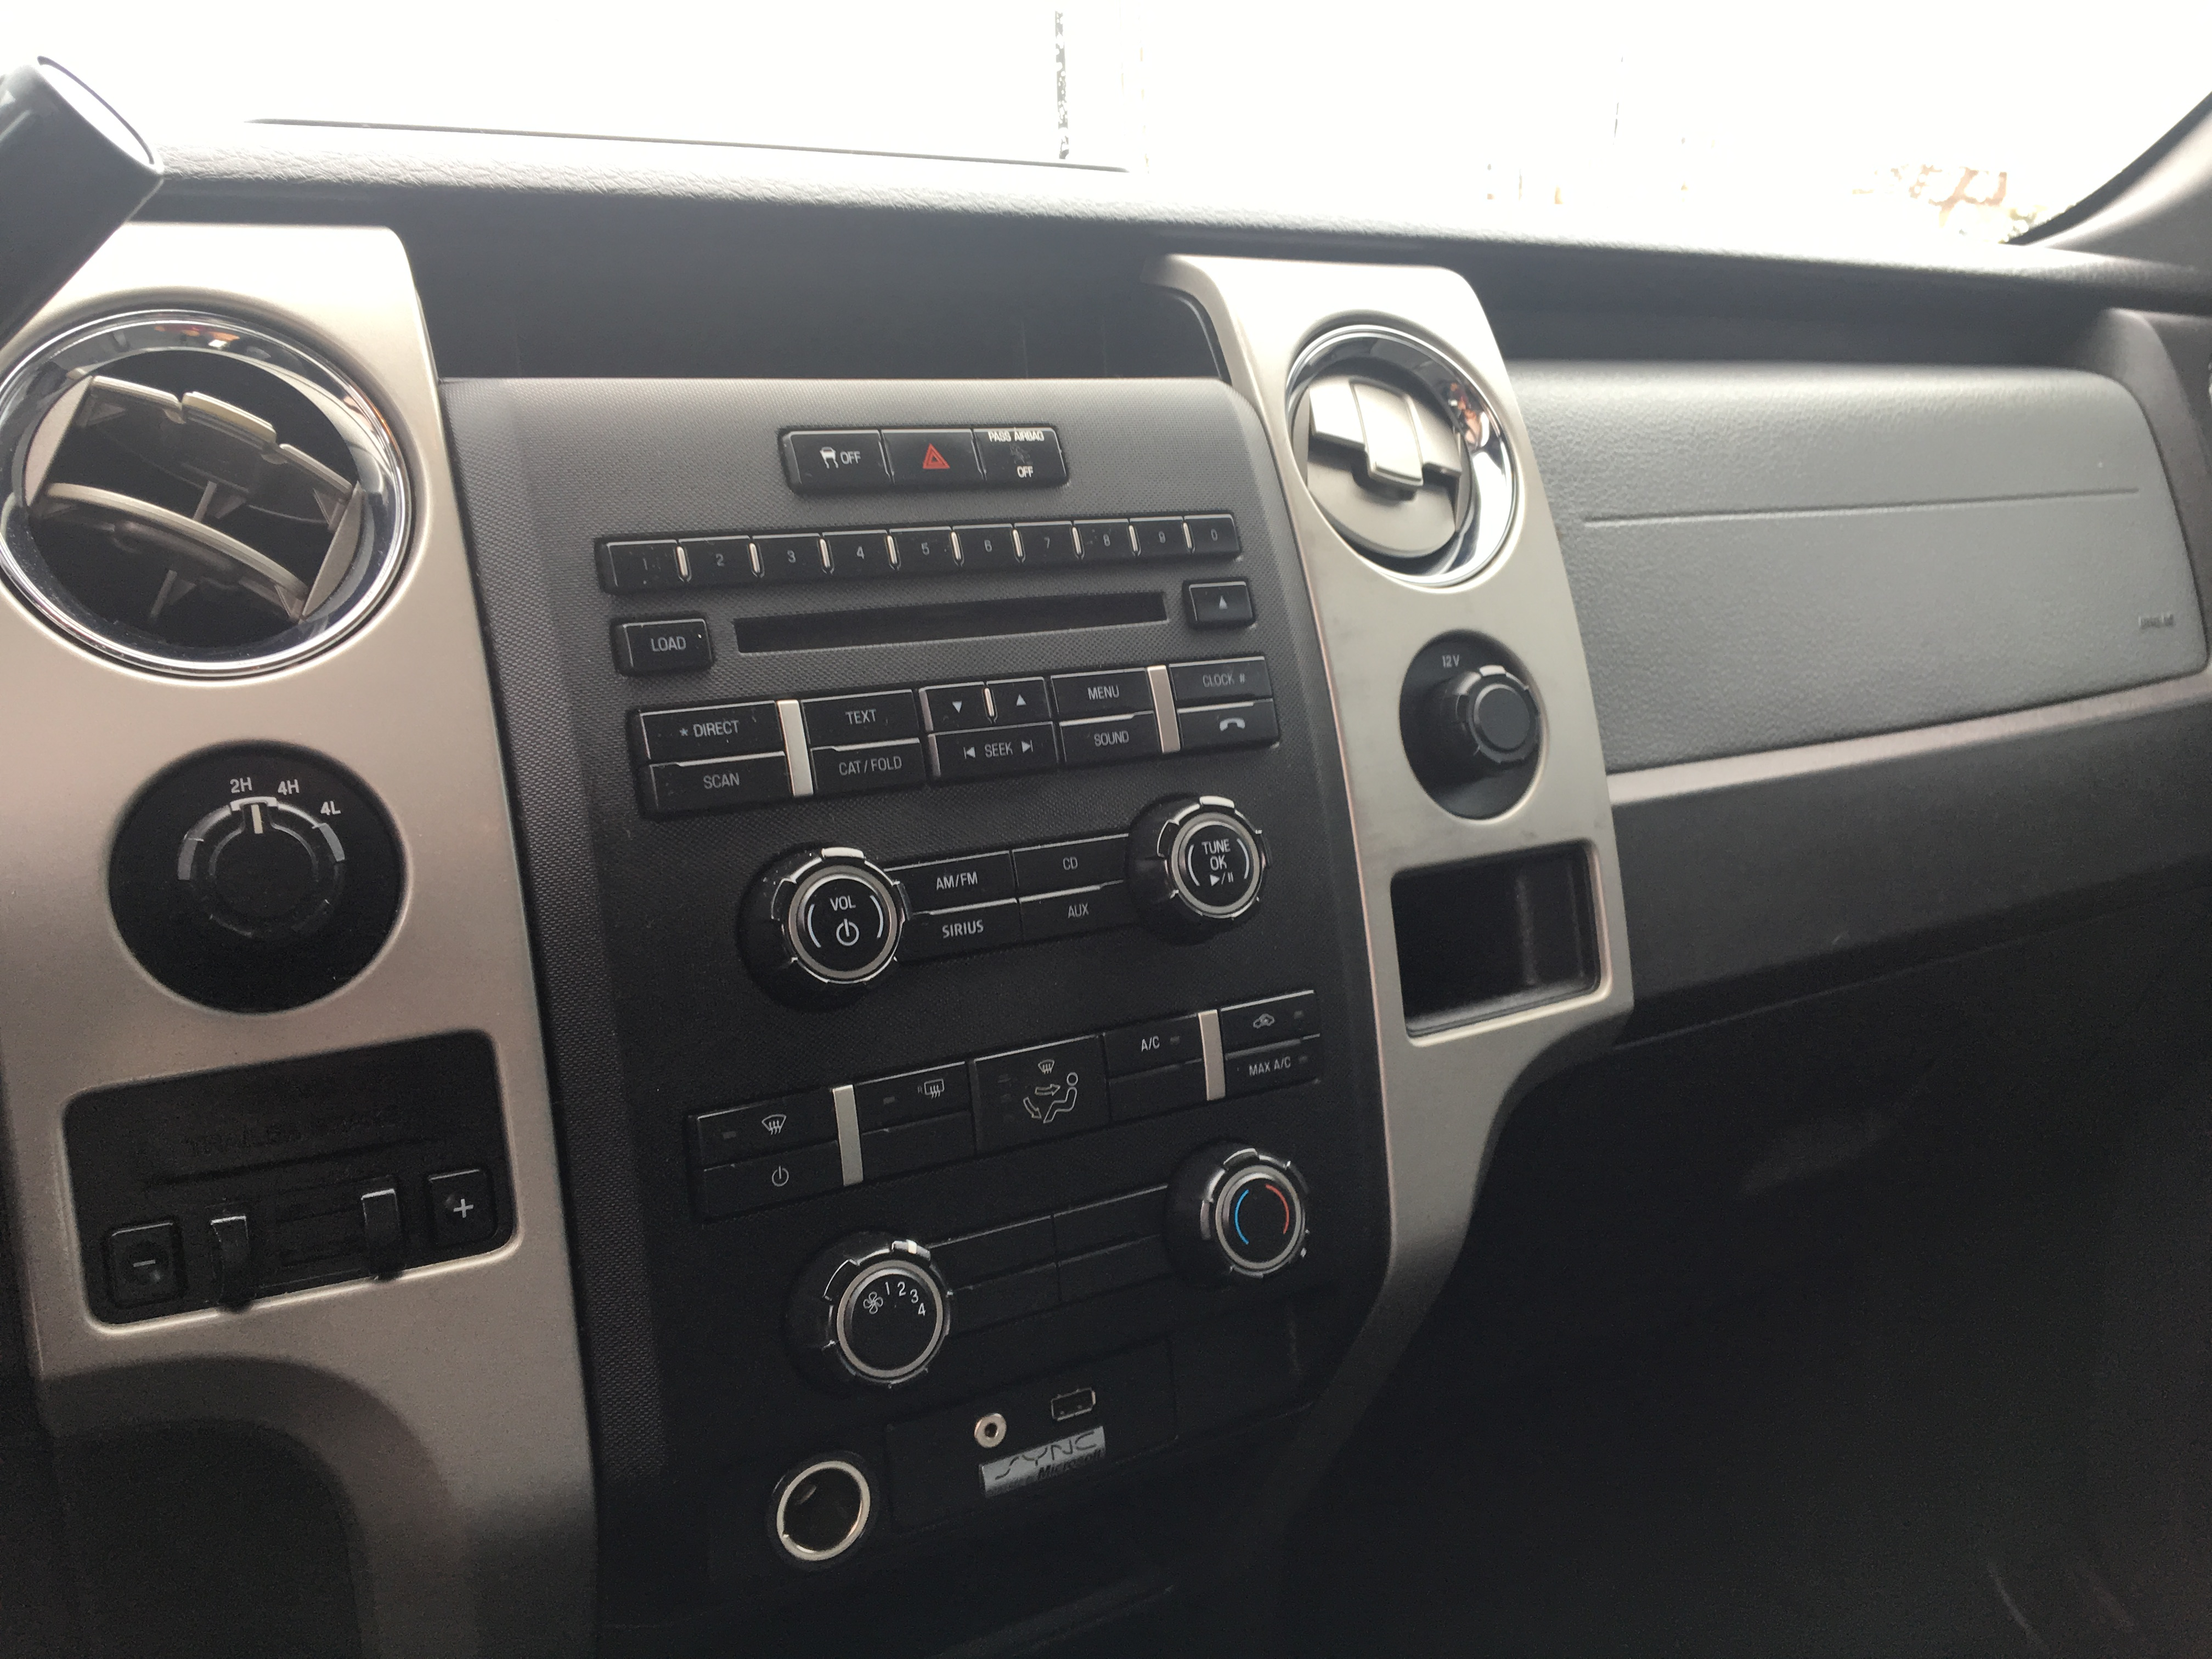 2012 Ford F-150 Supercab 4X4